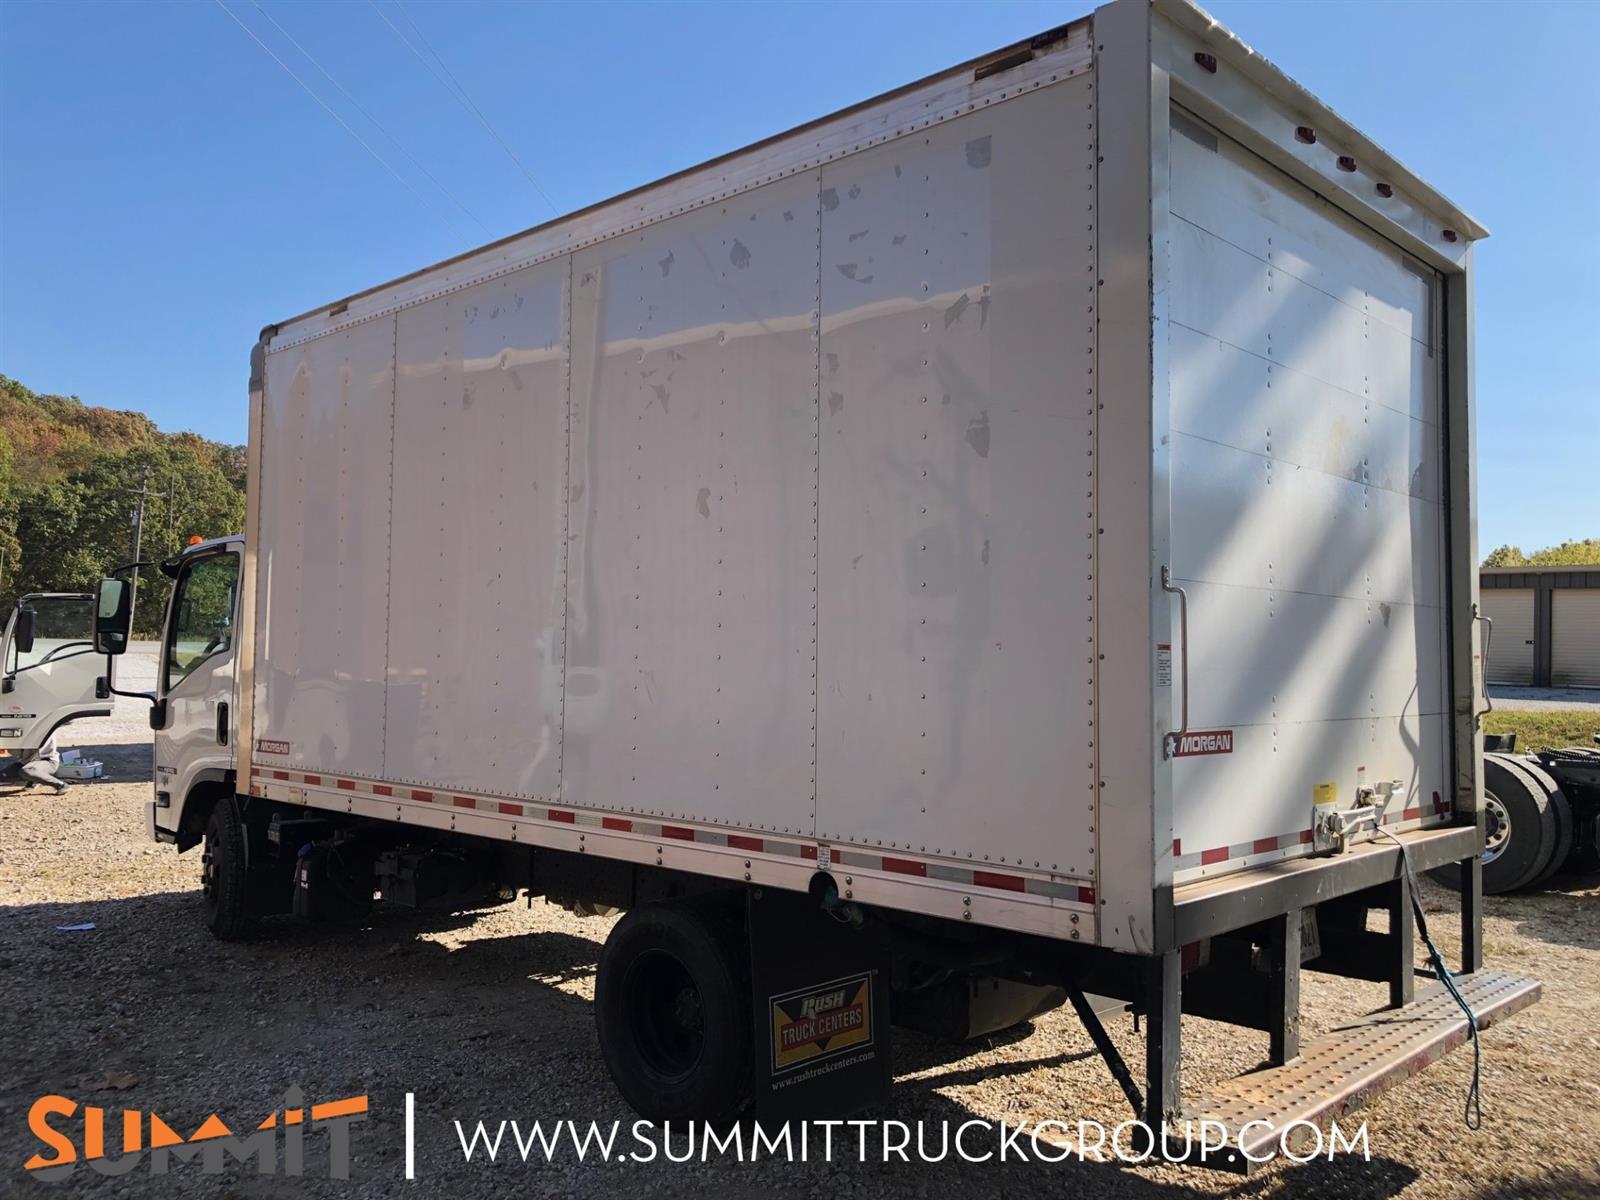 2016 Isuzu NPR Regular Cab 4x2, Dry Freight #150P201574 - photo 1